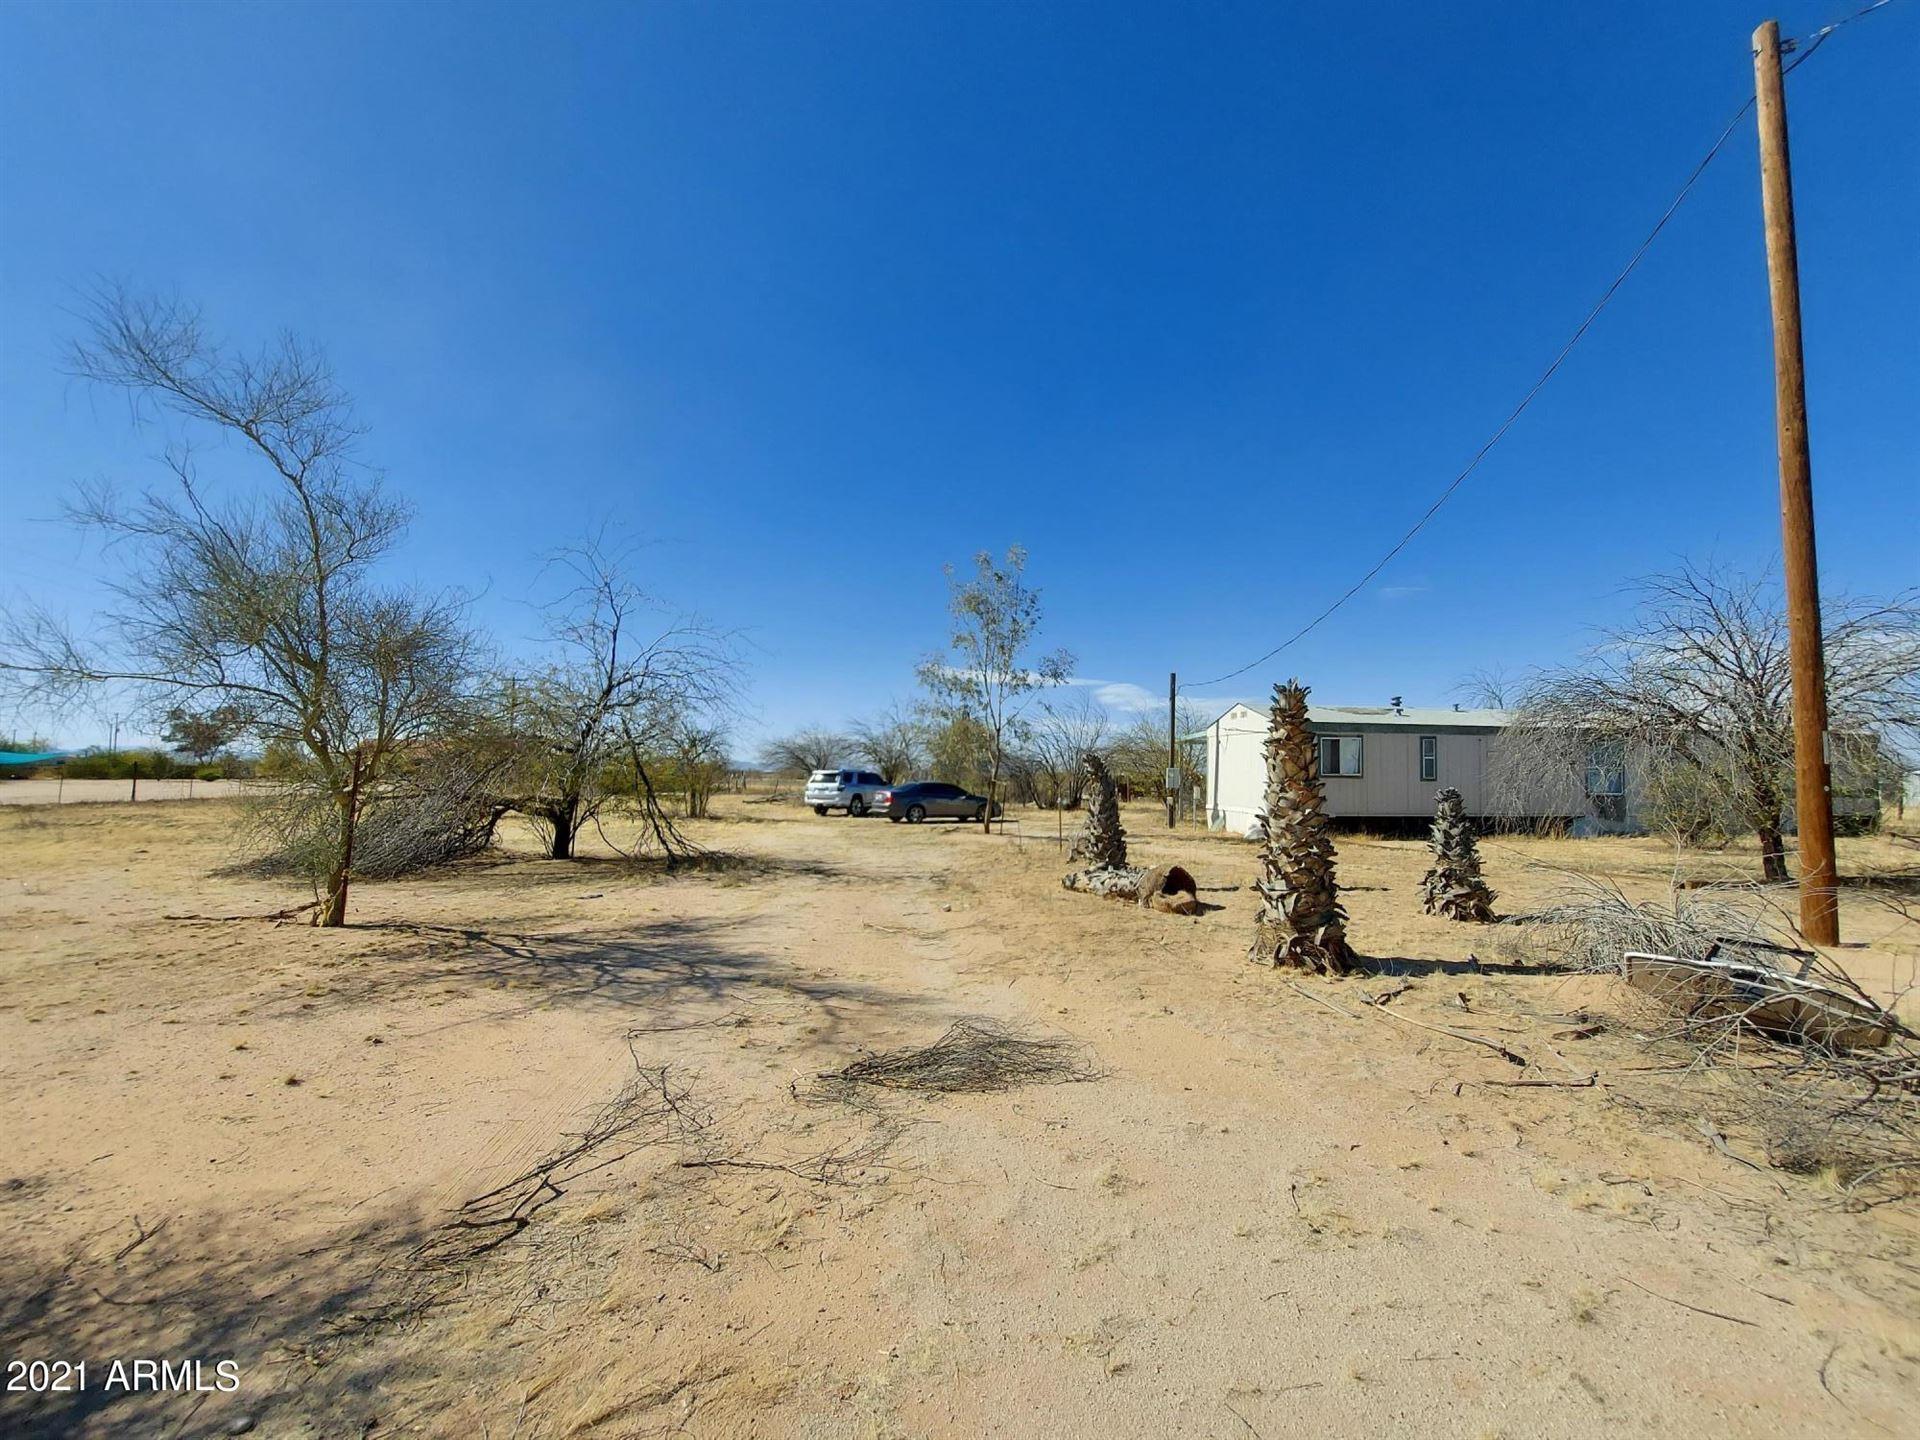 Photo for 15360 N SADDLEBACK VISTA Avenue, Maricopa, AZ 85138 (MLS # 6197841)